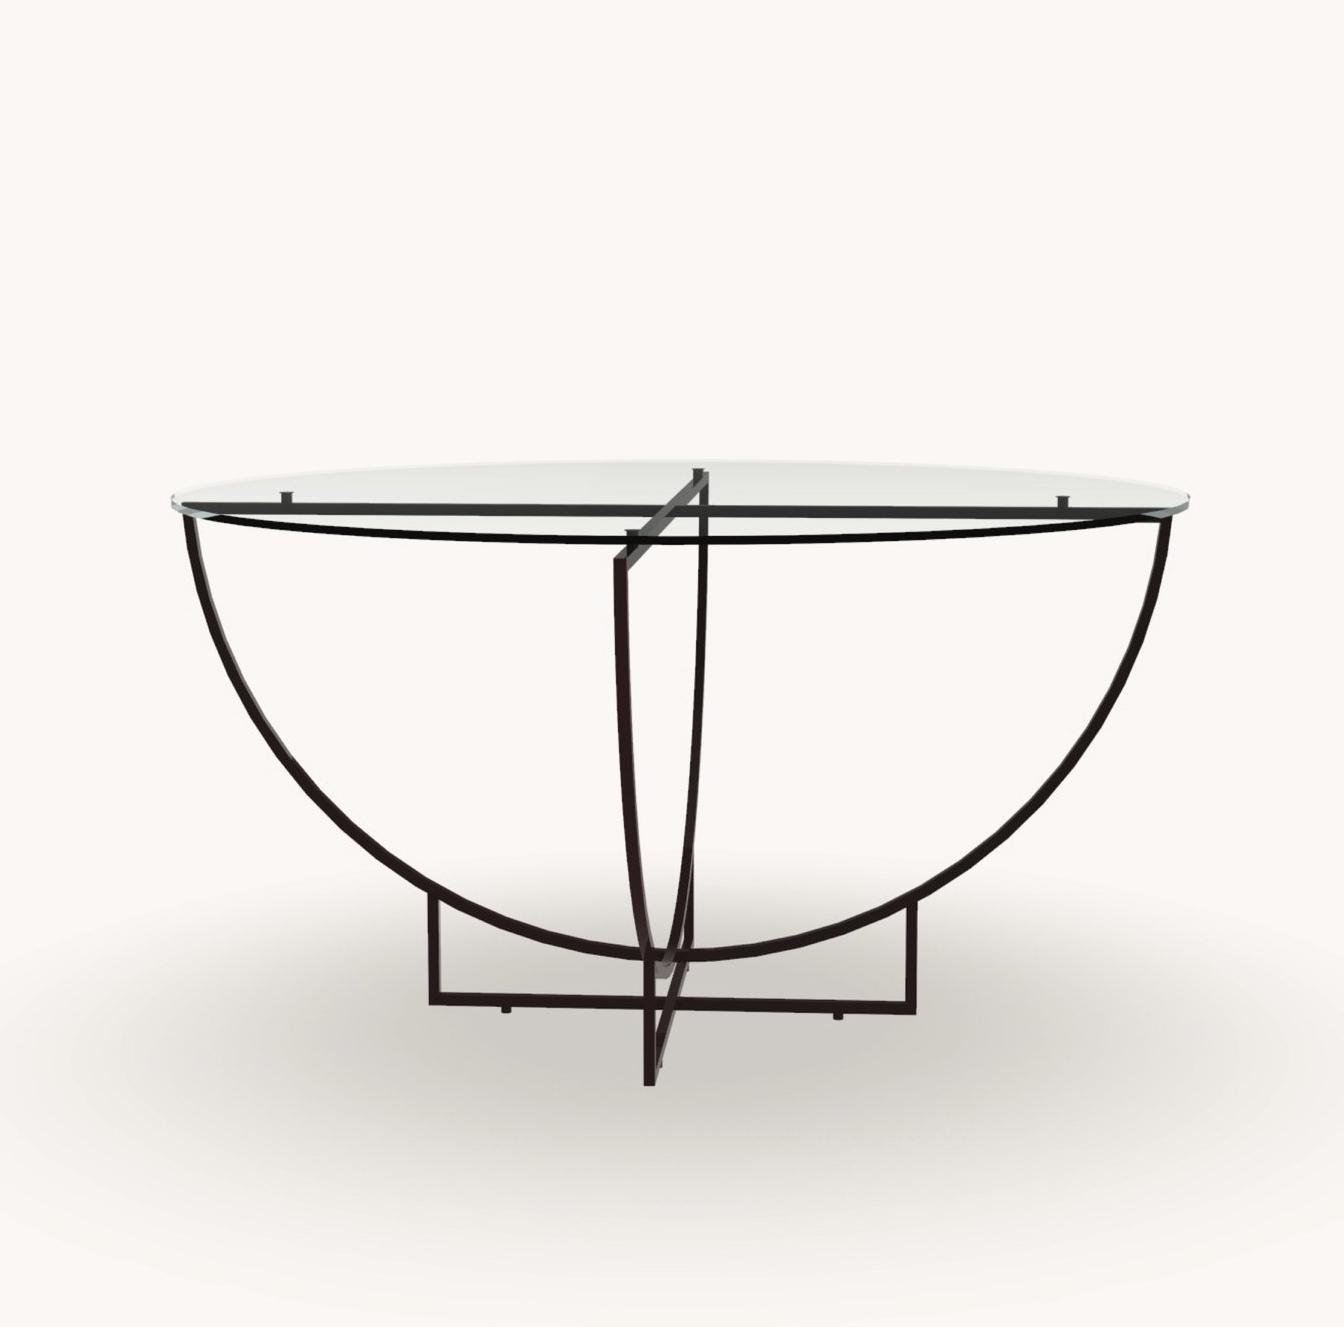 DINING TABLE. RO - DKK 27.900 · EUR 3740